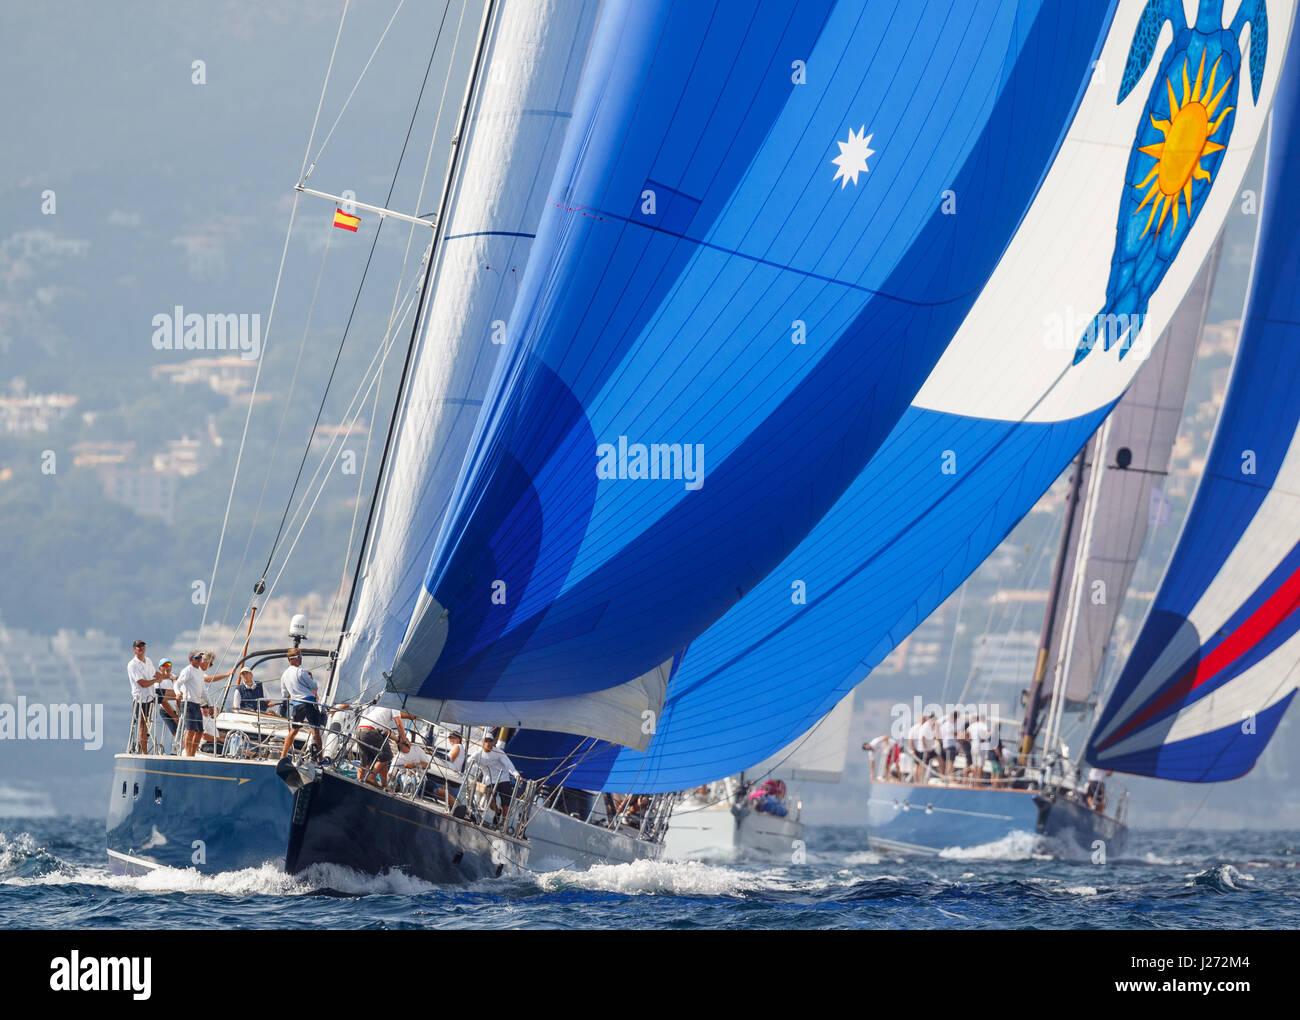 Sailing yacht Race Immagini Stock